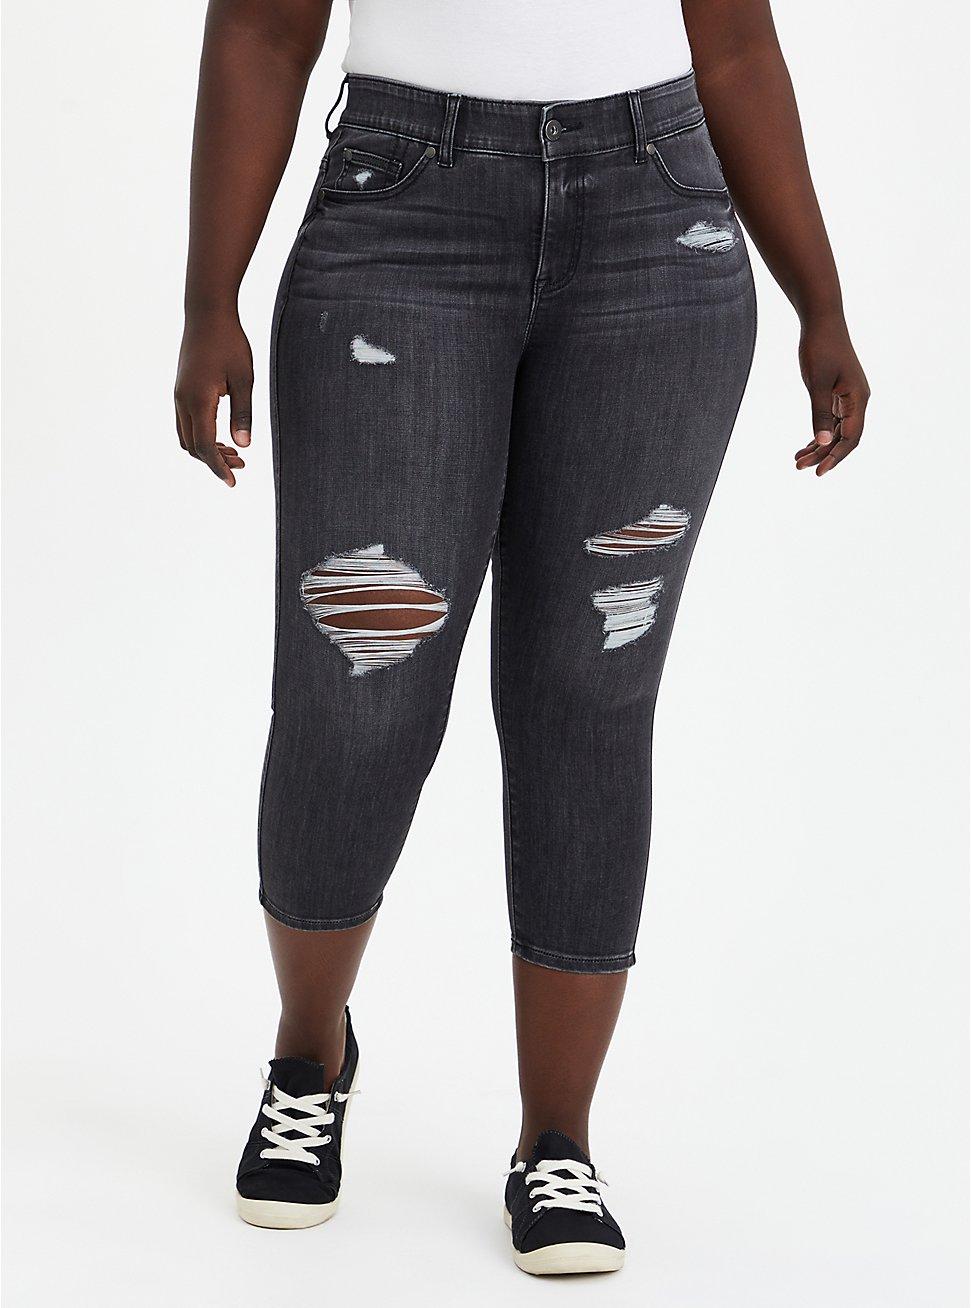 Crop Bombshell Skinny Jean - Super Soft Washed Black, , fitModel1-hires